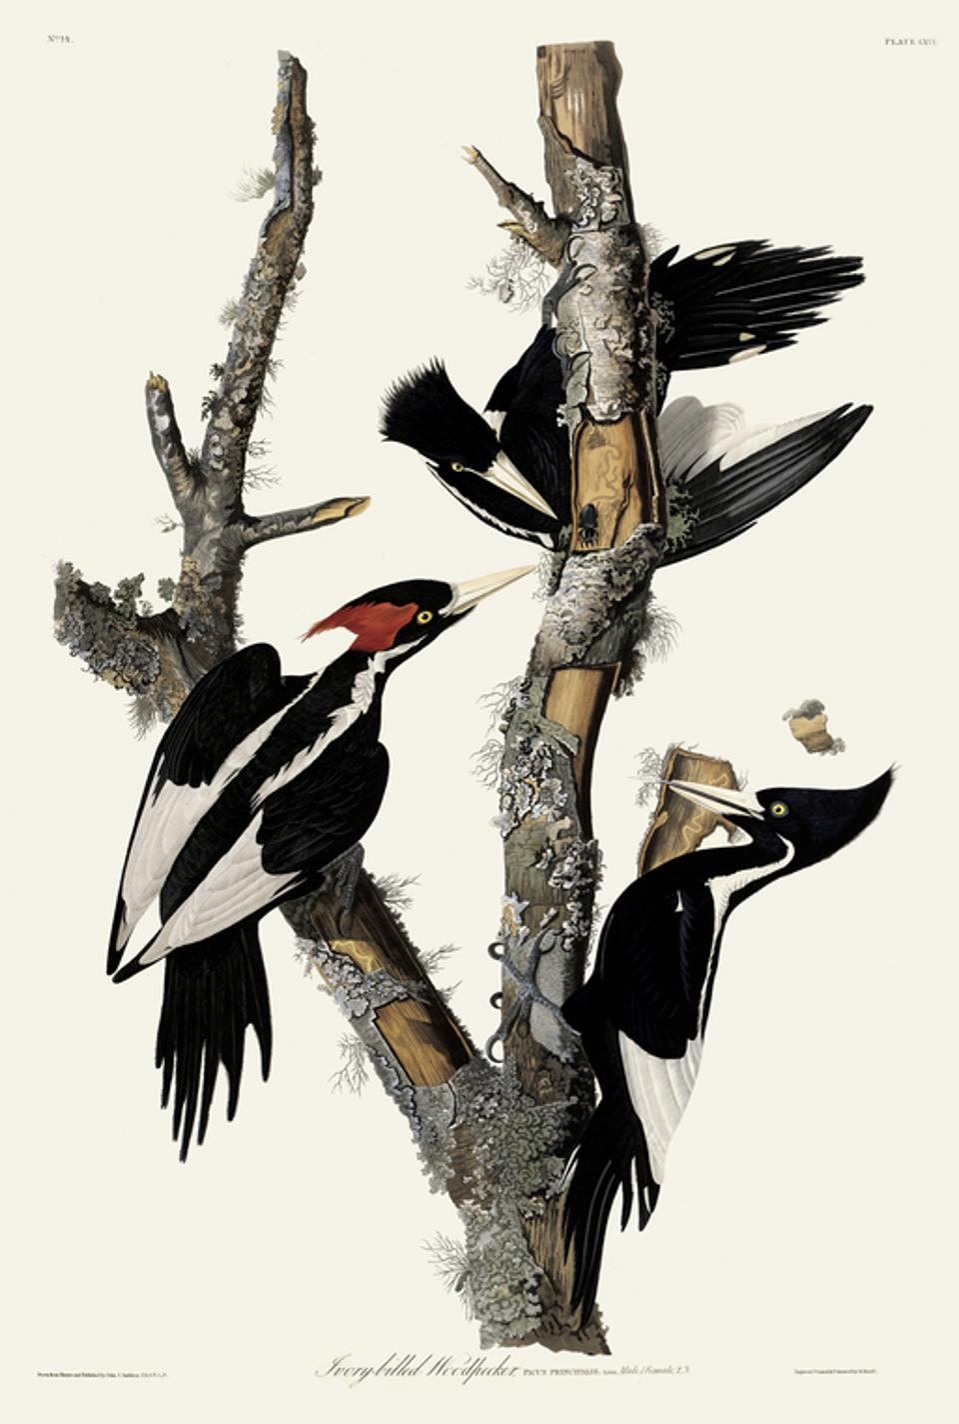 John James Audubon's 'Ivory-billed Woodpecker' from his 'Birds of America' book.